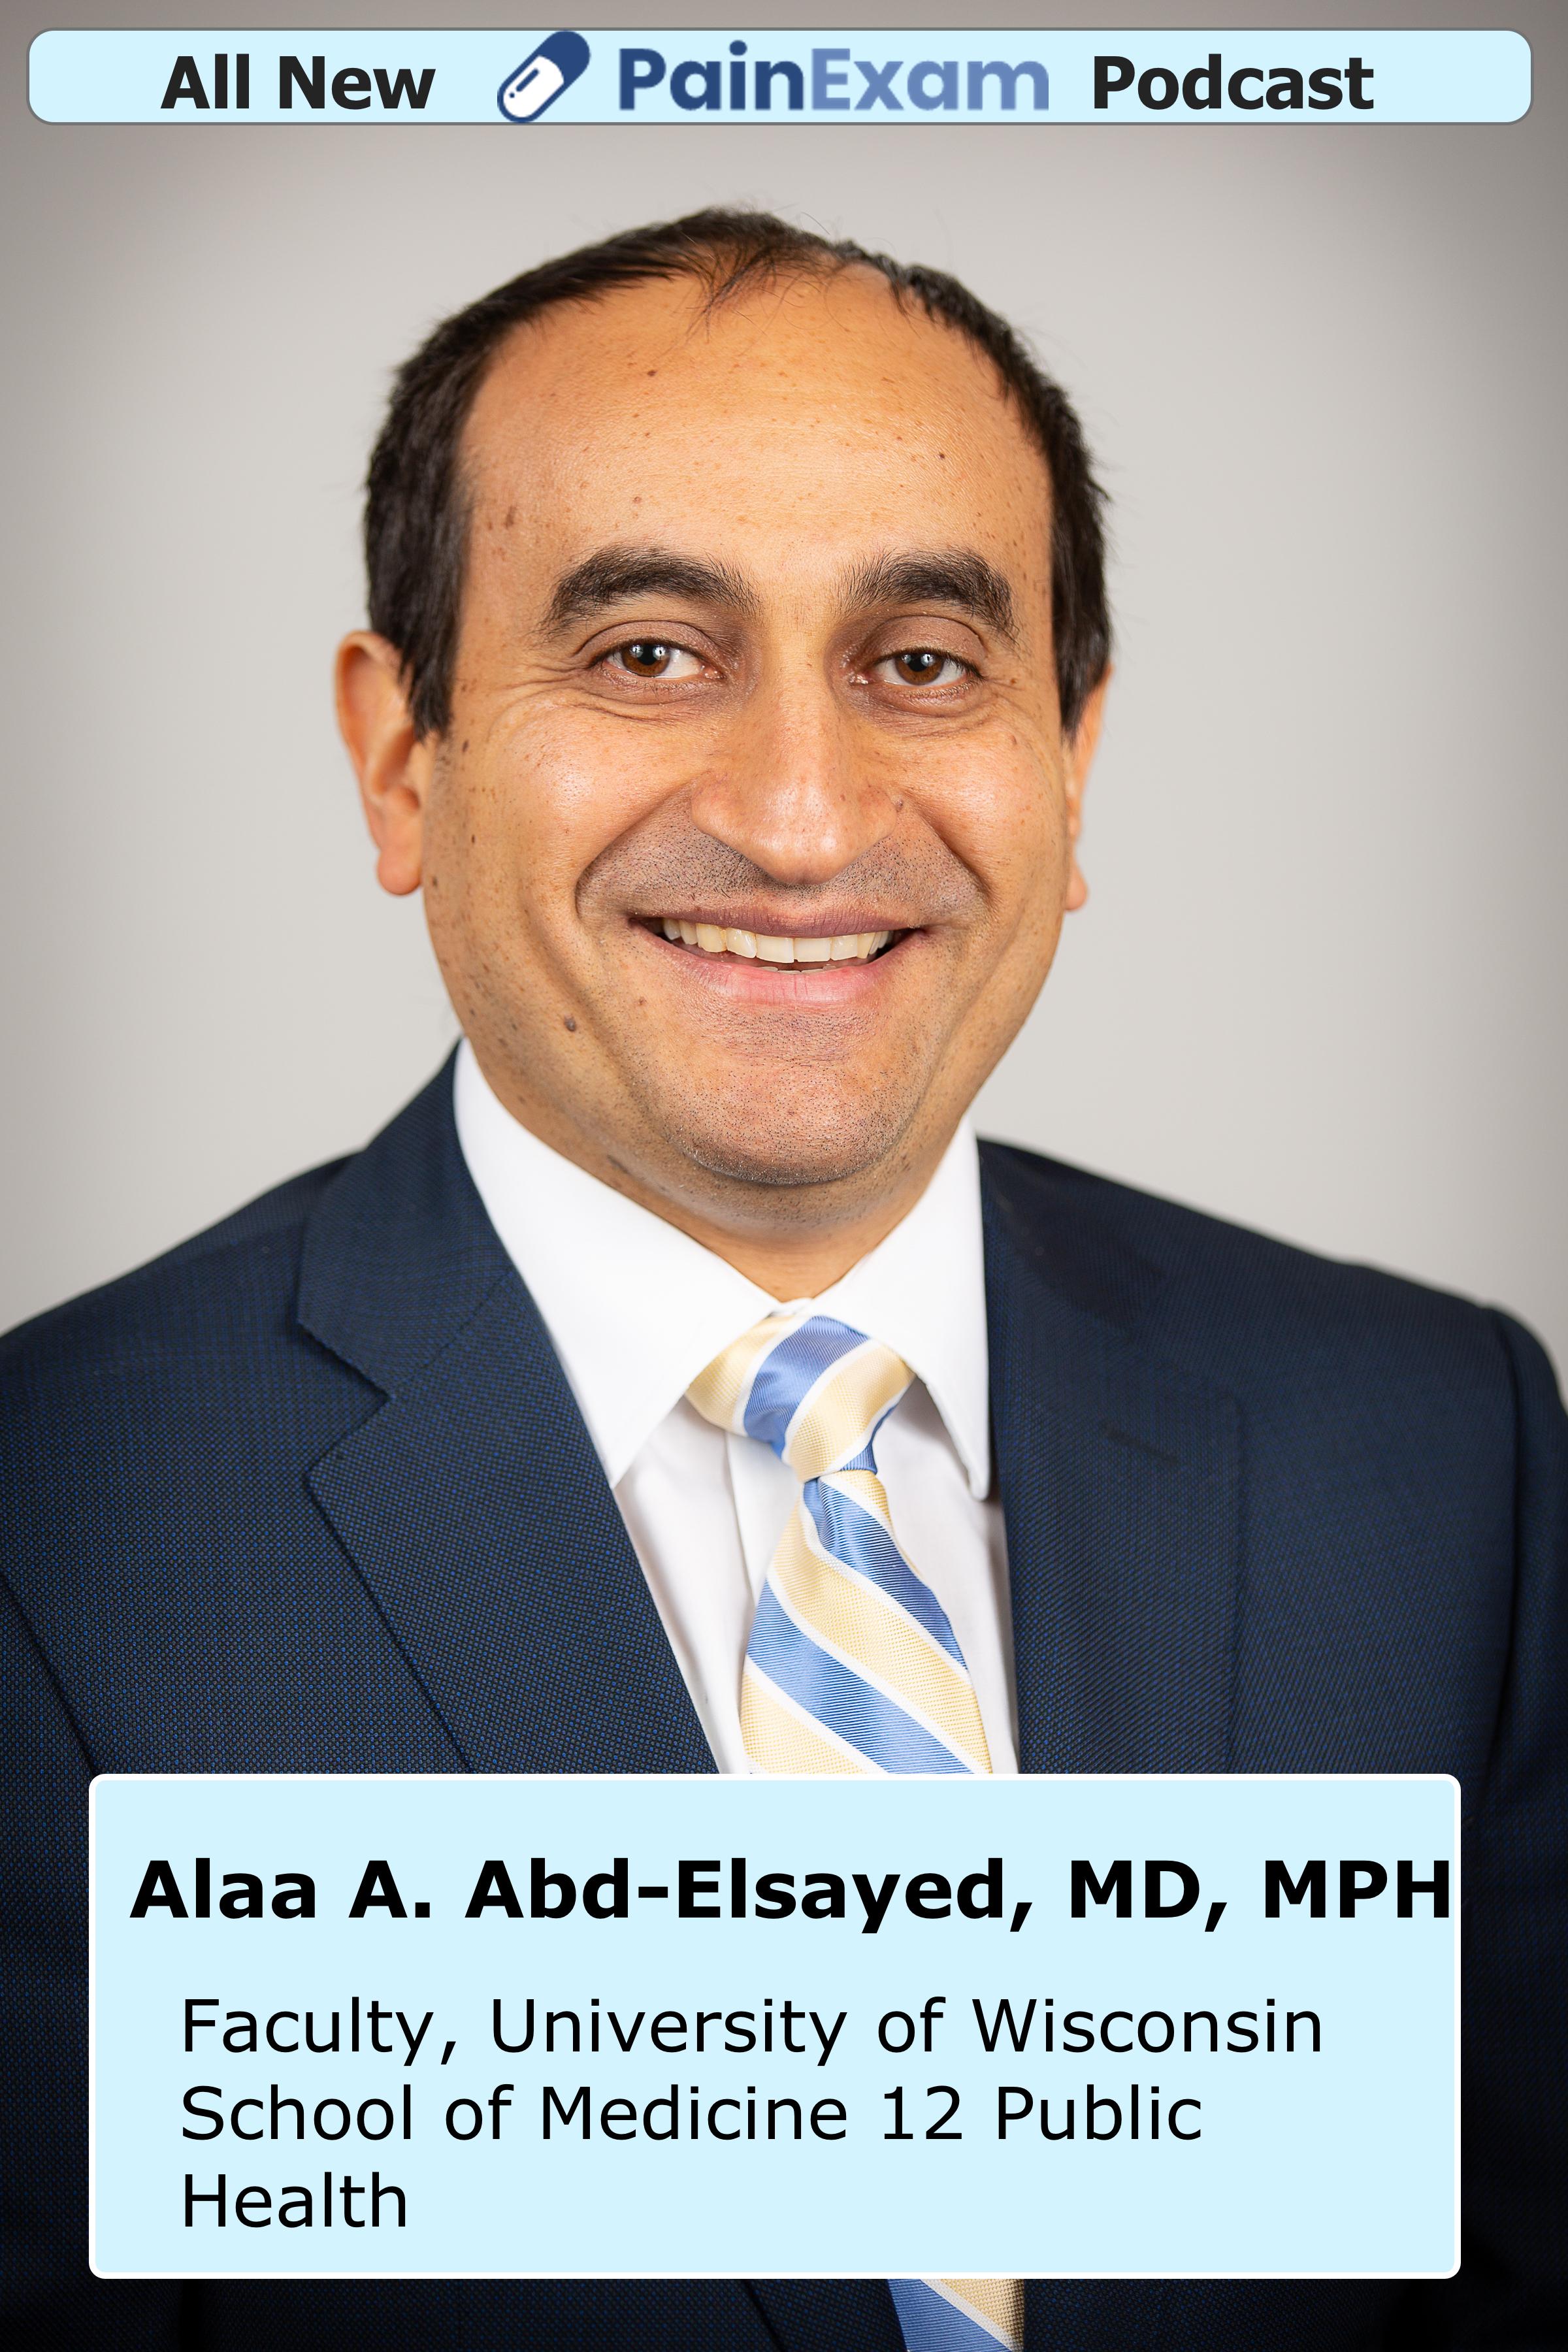 Alaa Abd-Elsayed, MD, MPH